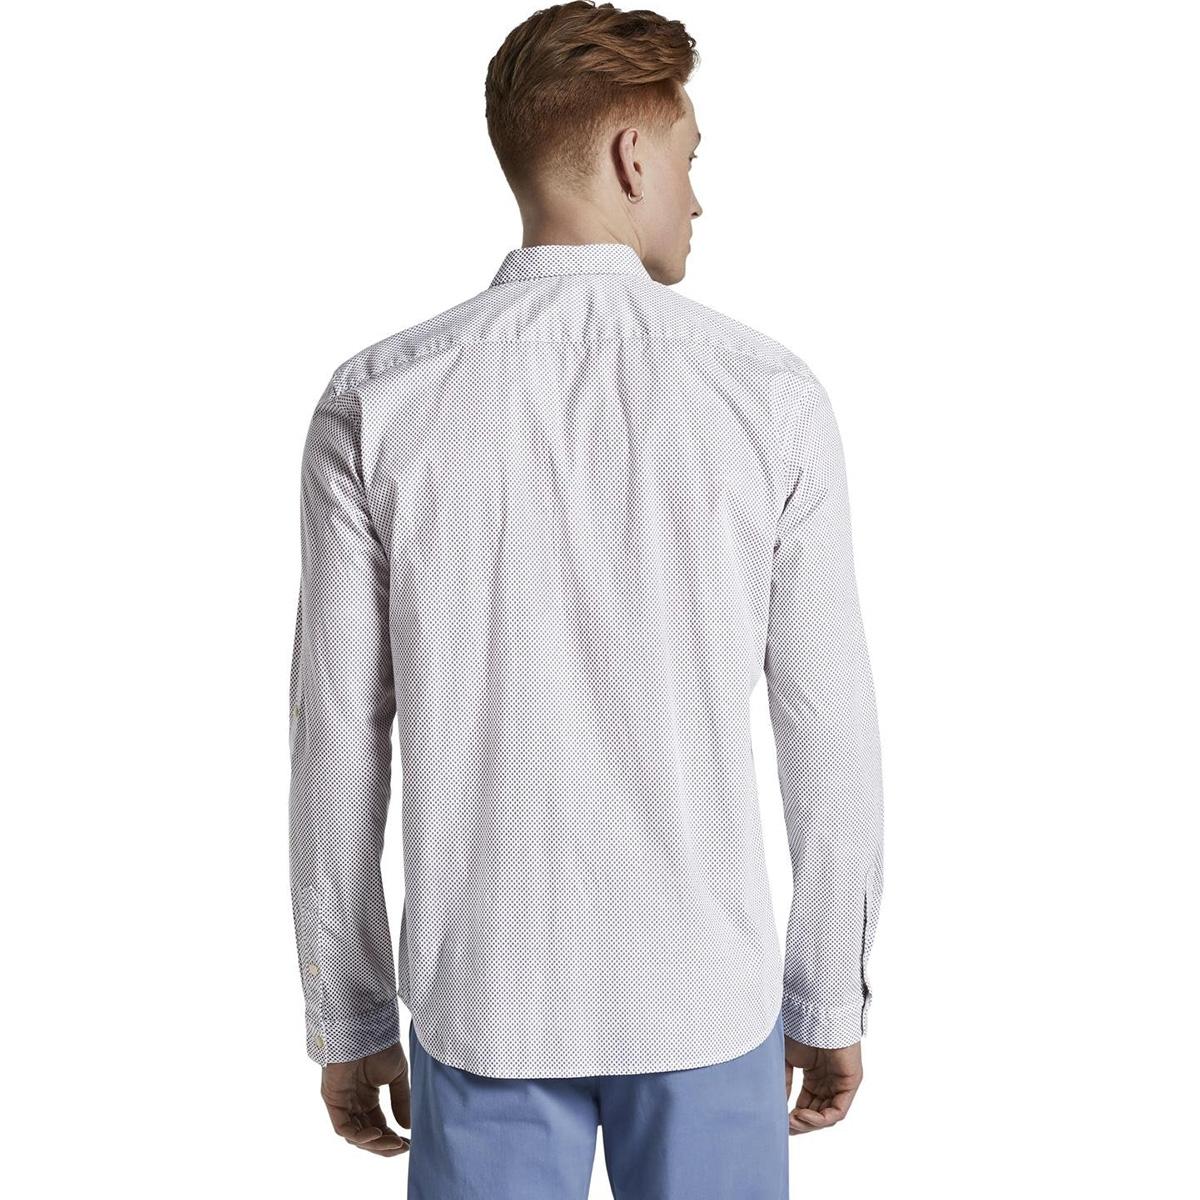 overhemd met opdruk 1018799xx12 tom tailor overhemd 22857